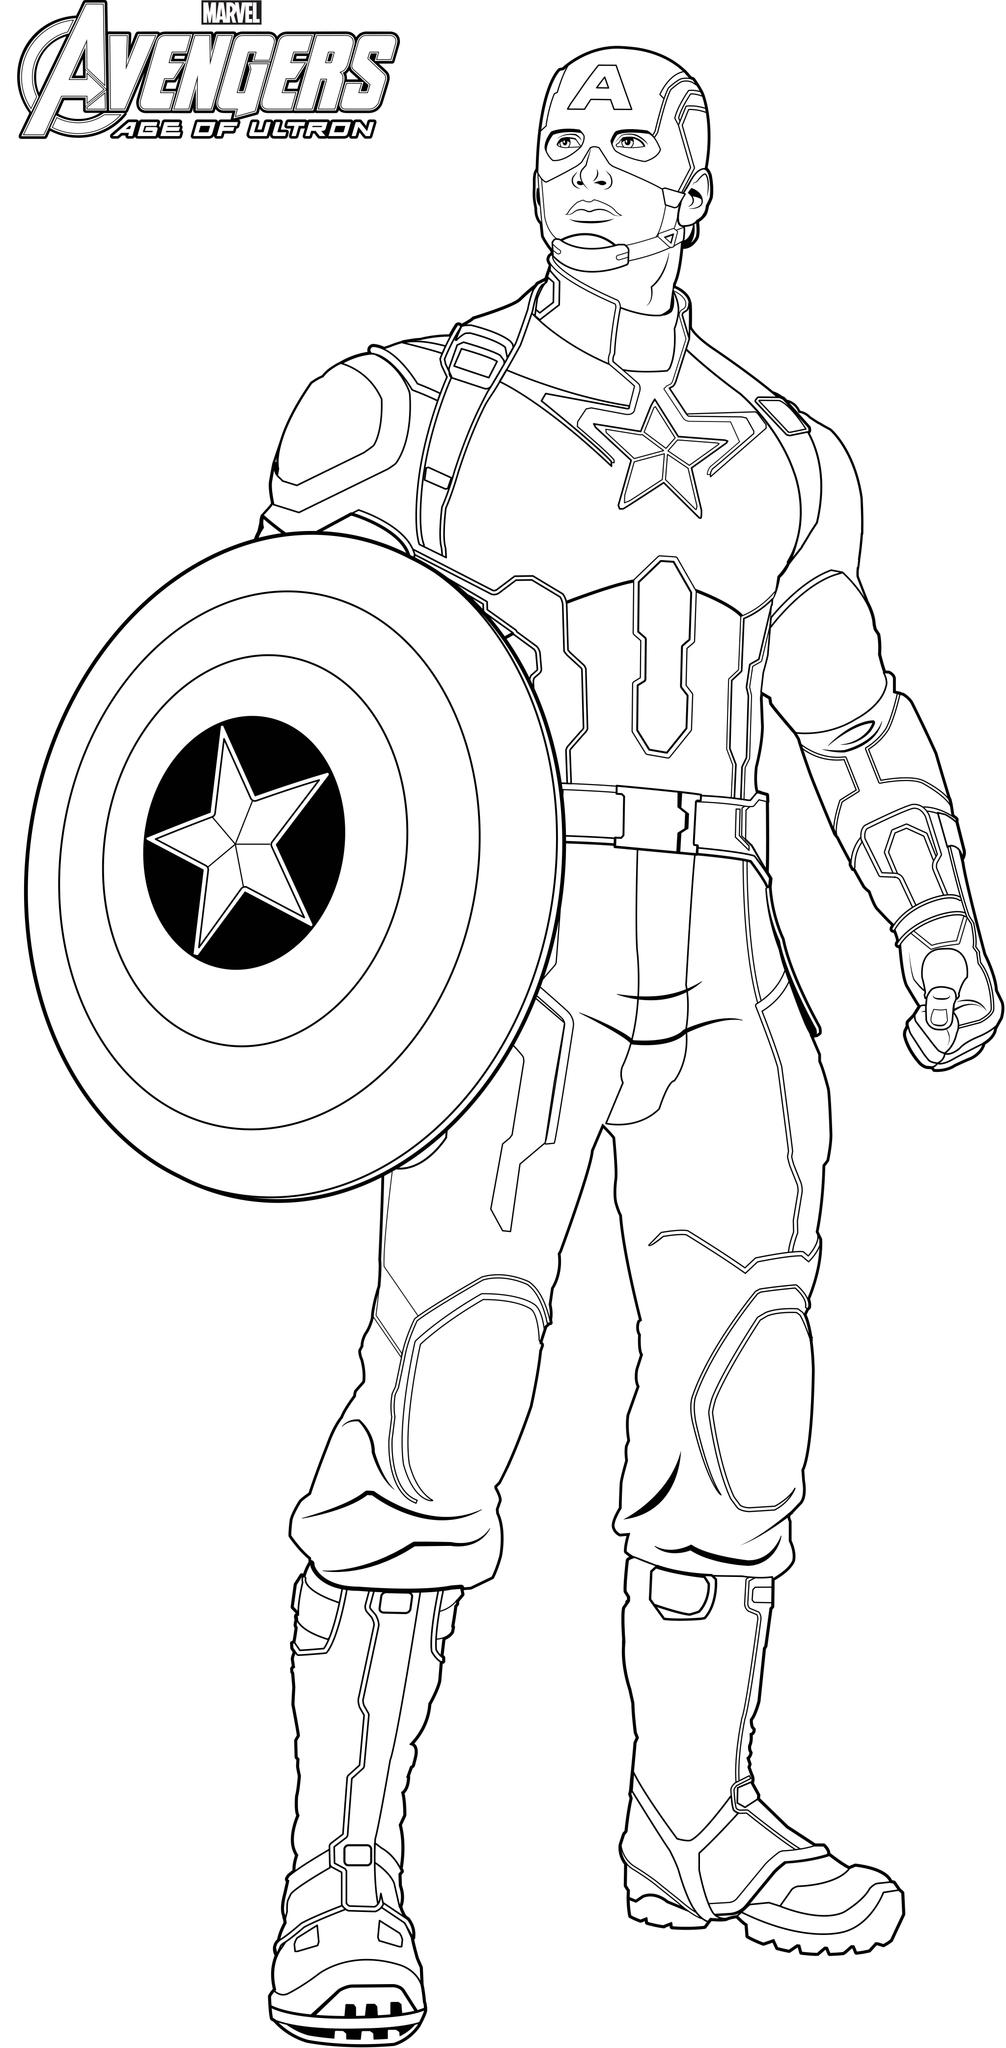 Captain America (Superheroes) - Page 3 - Printable ...